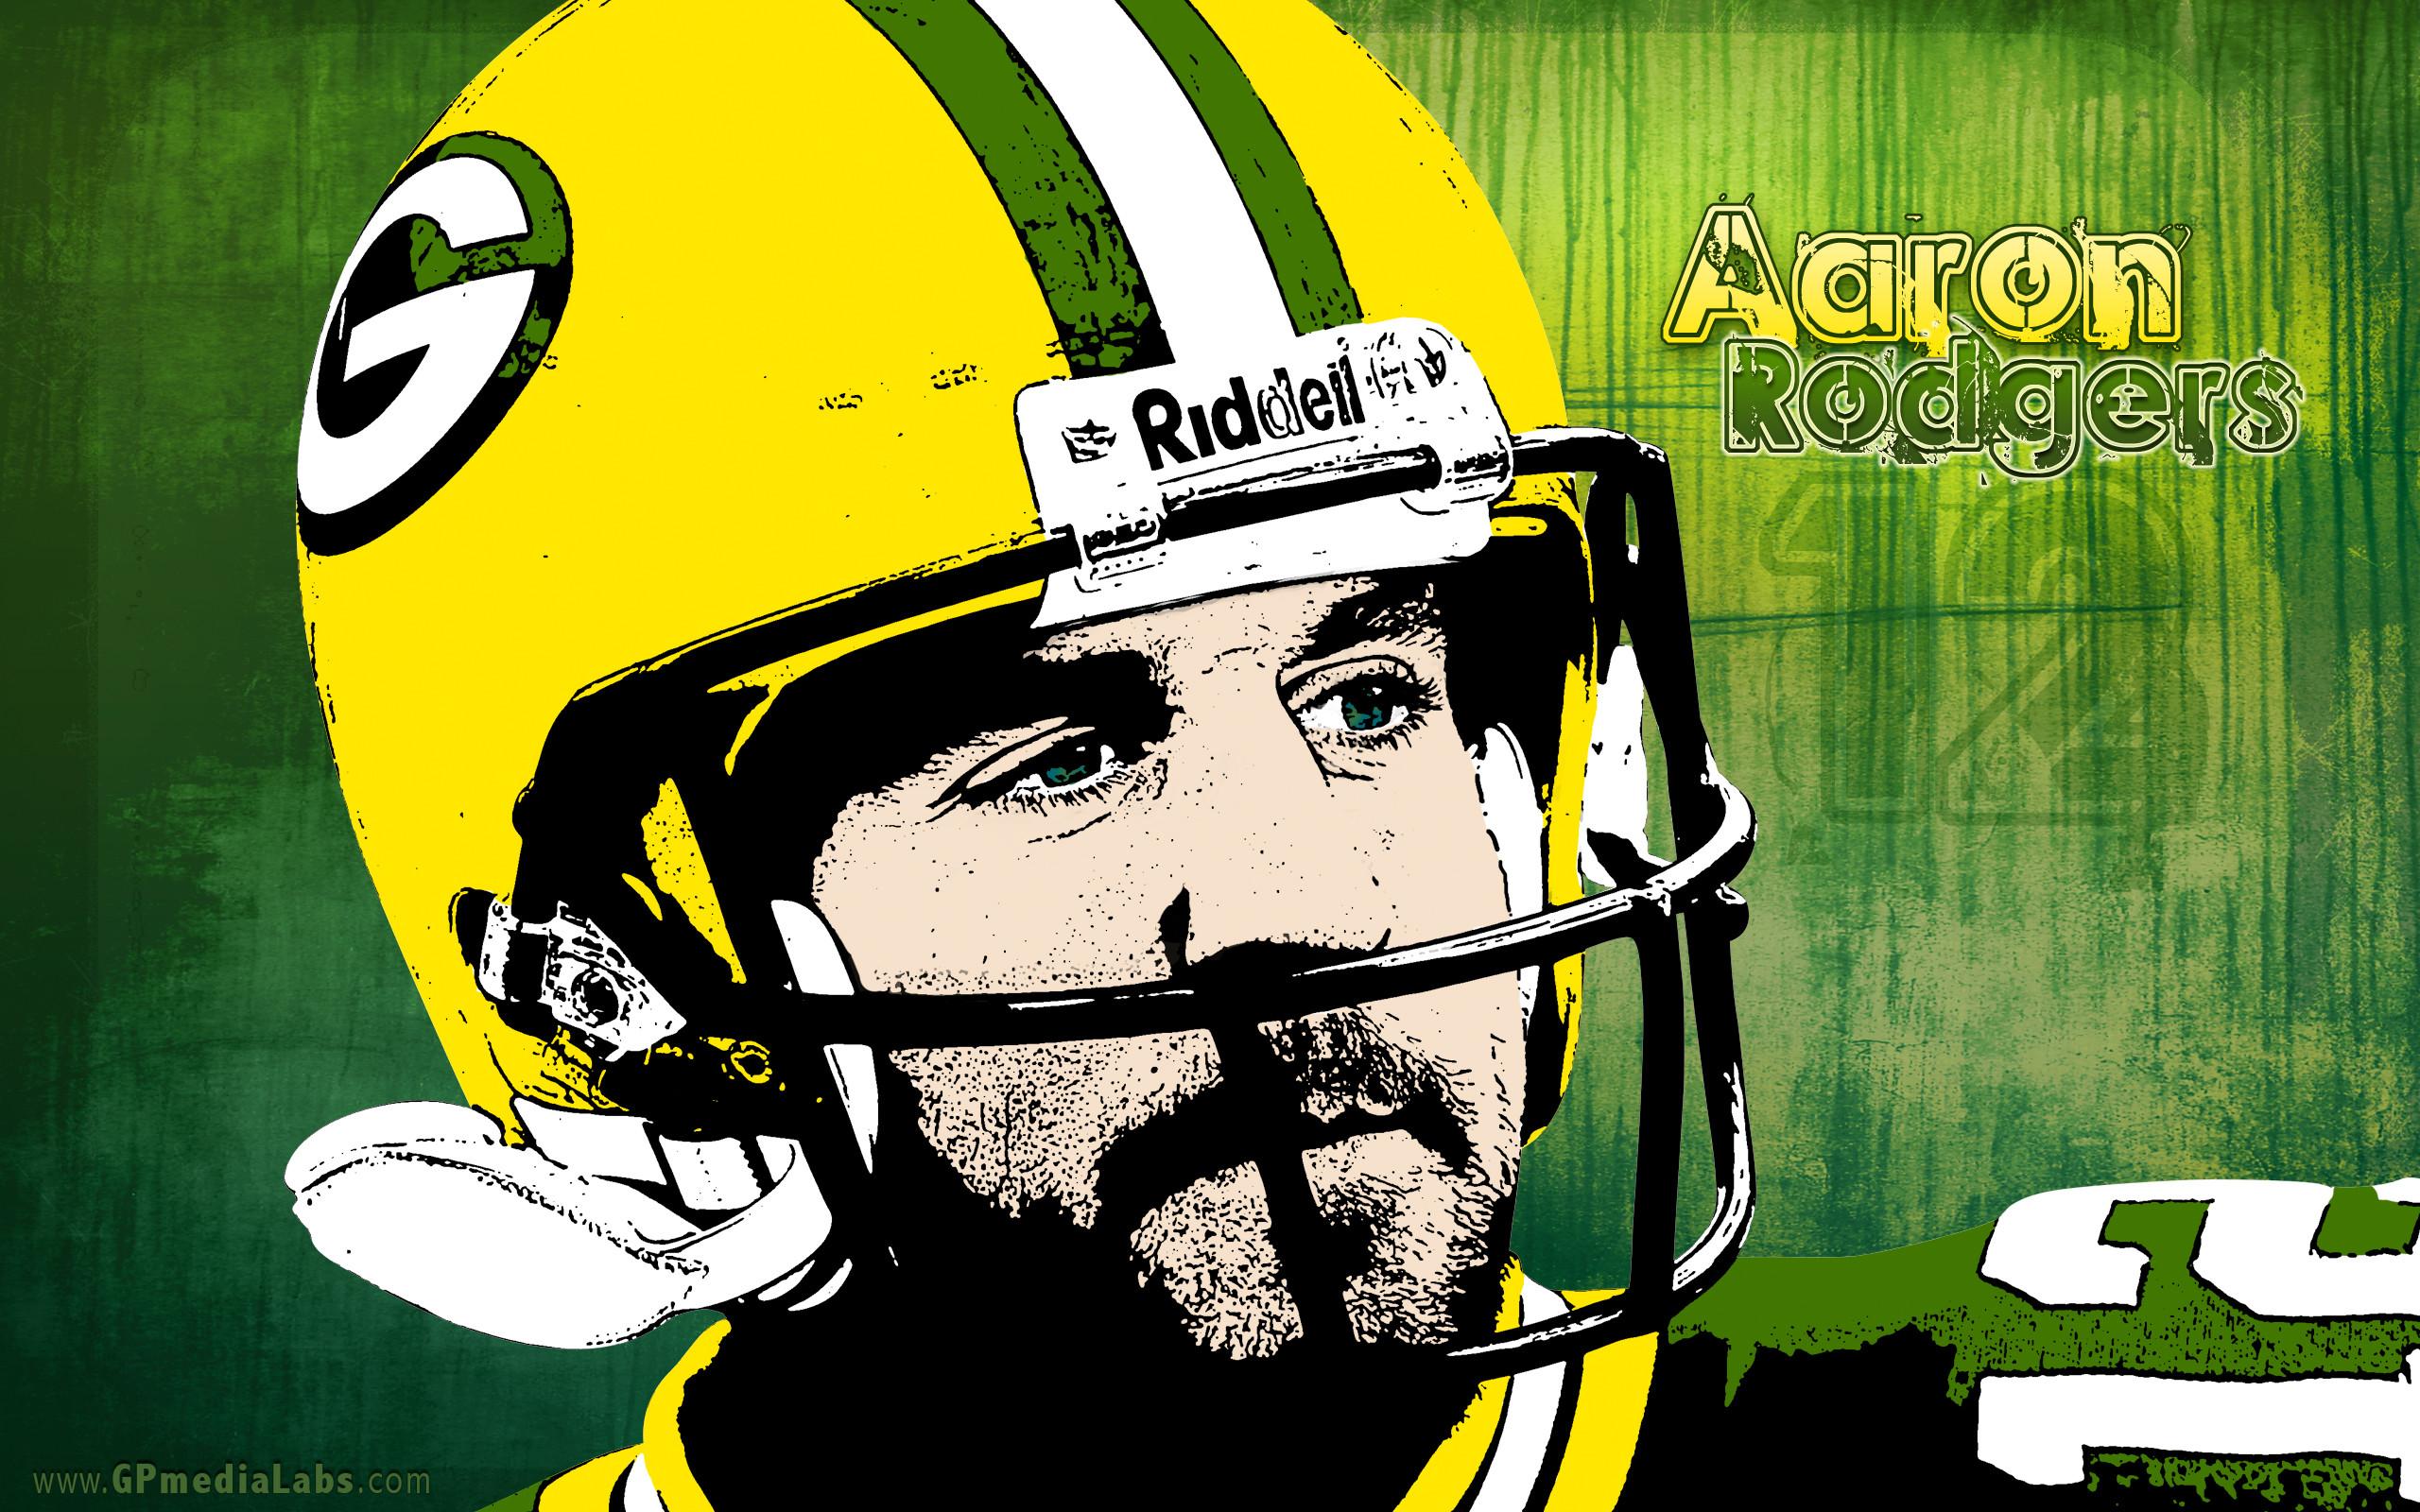 2560x1600 Green Bay Packers Wallpaper